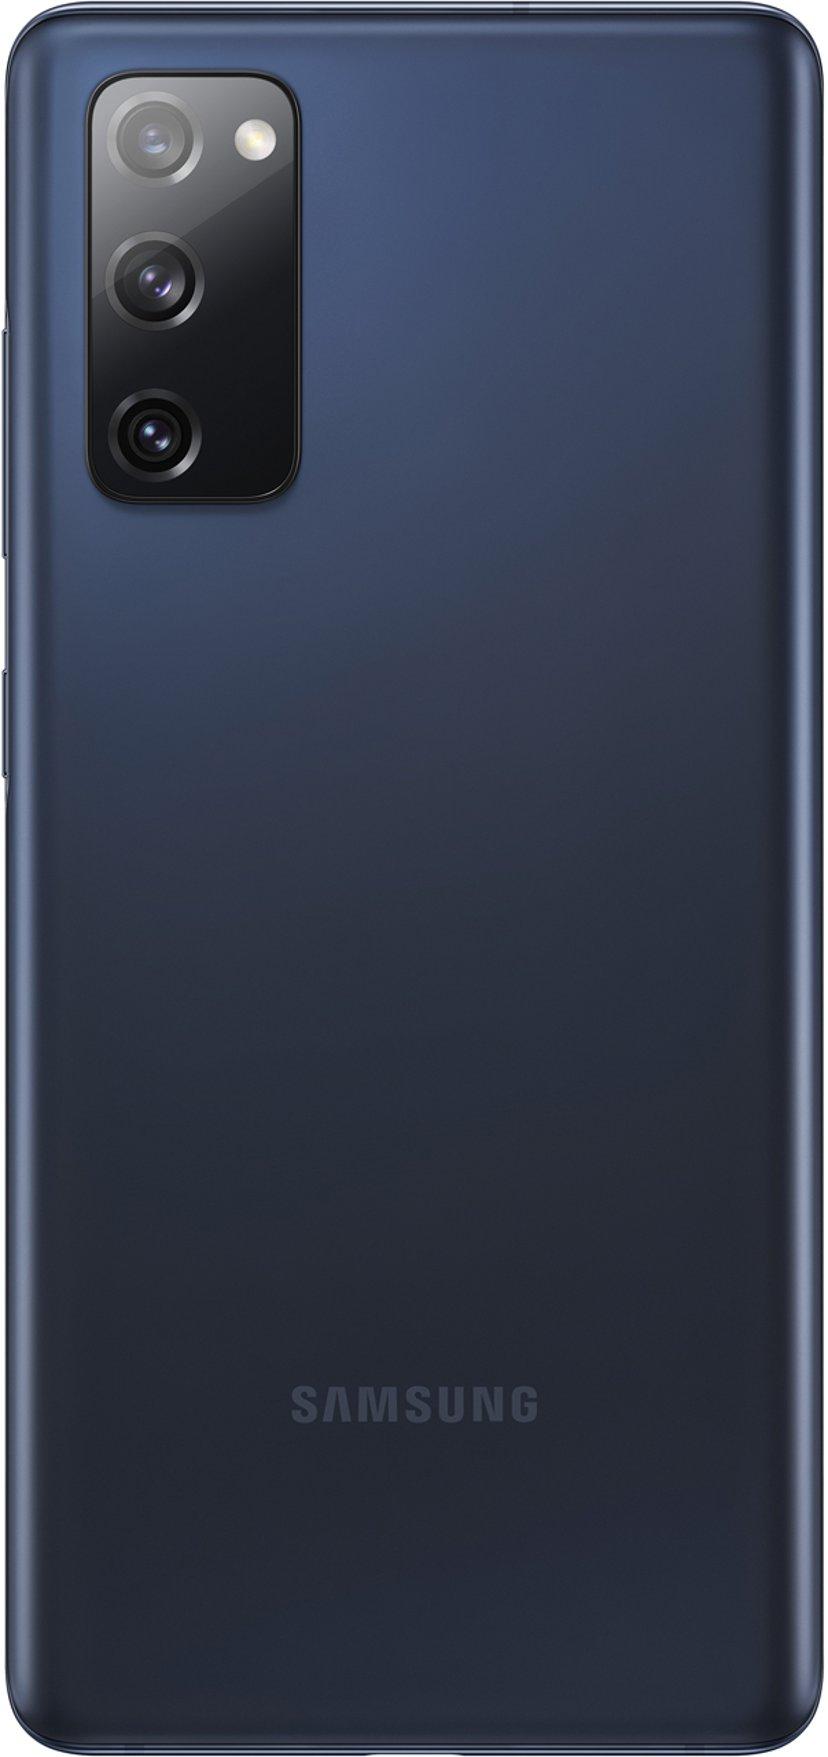 Samsung Galaxy S20 FE 5G 128GB Dual-SIM Marinblått moln